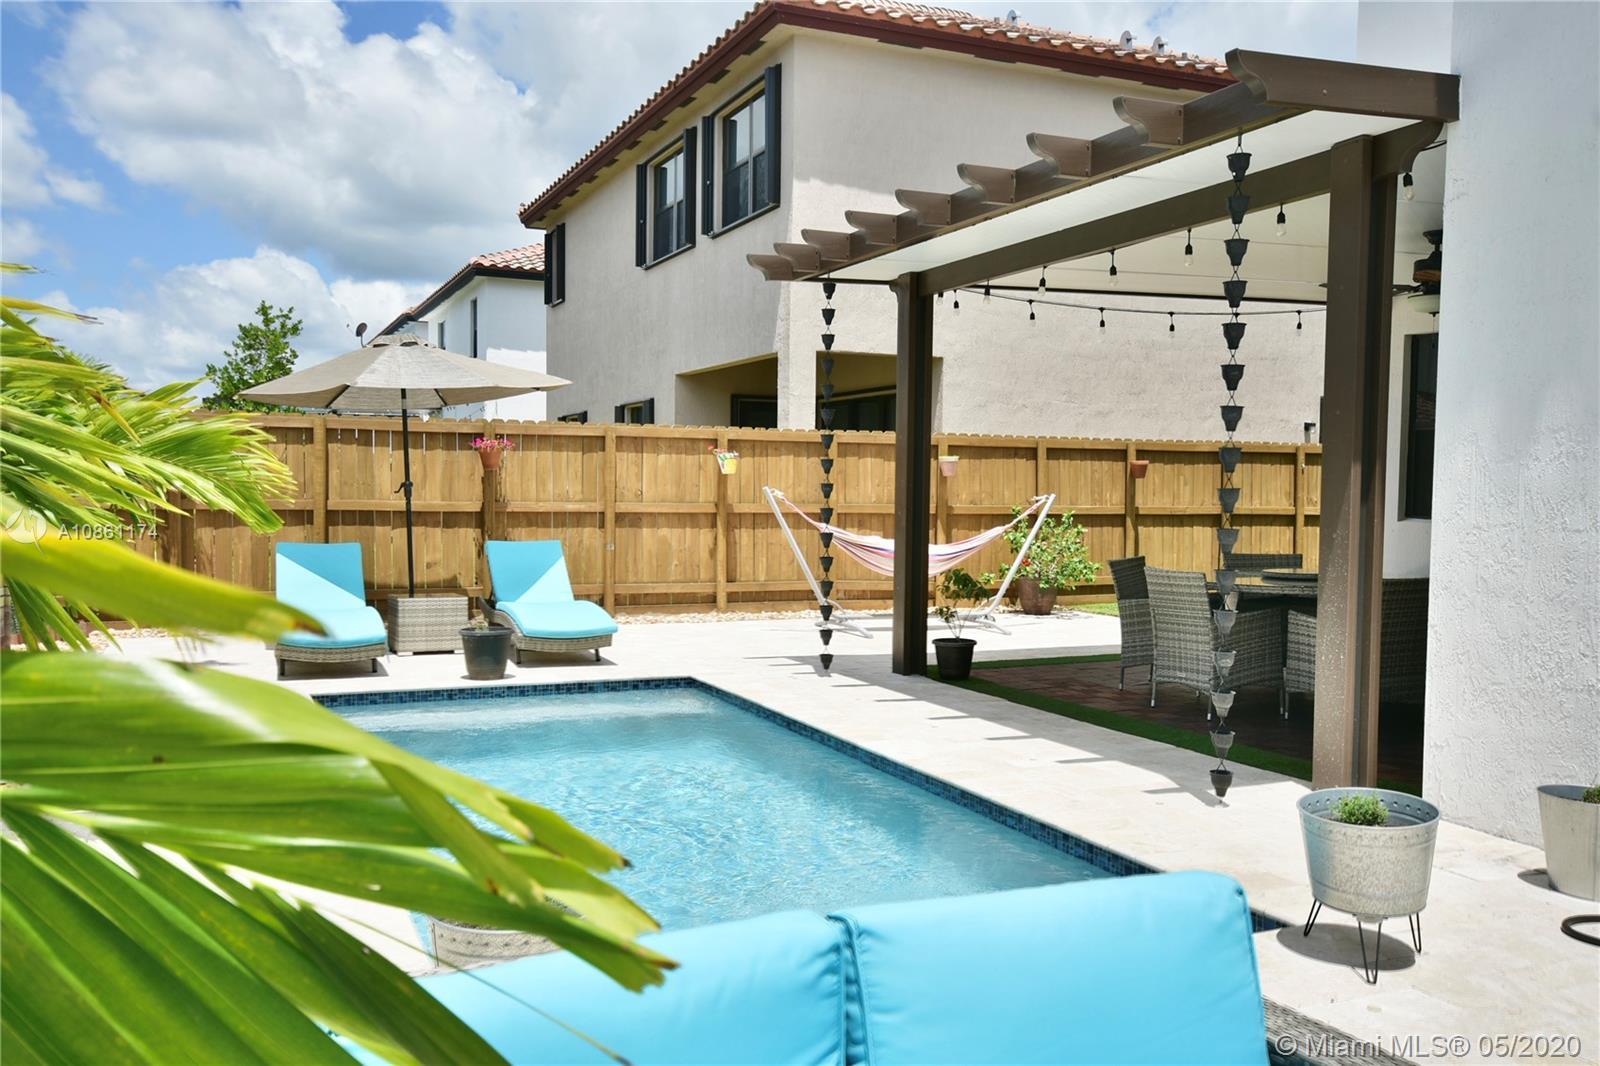 11740 SW 248th Ter, Homestead, FL 33032 - Homestead, FL real estate listing